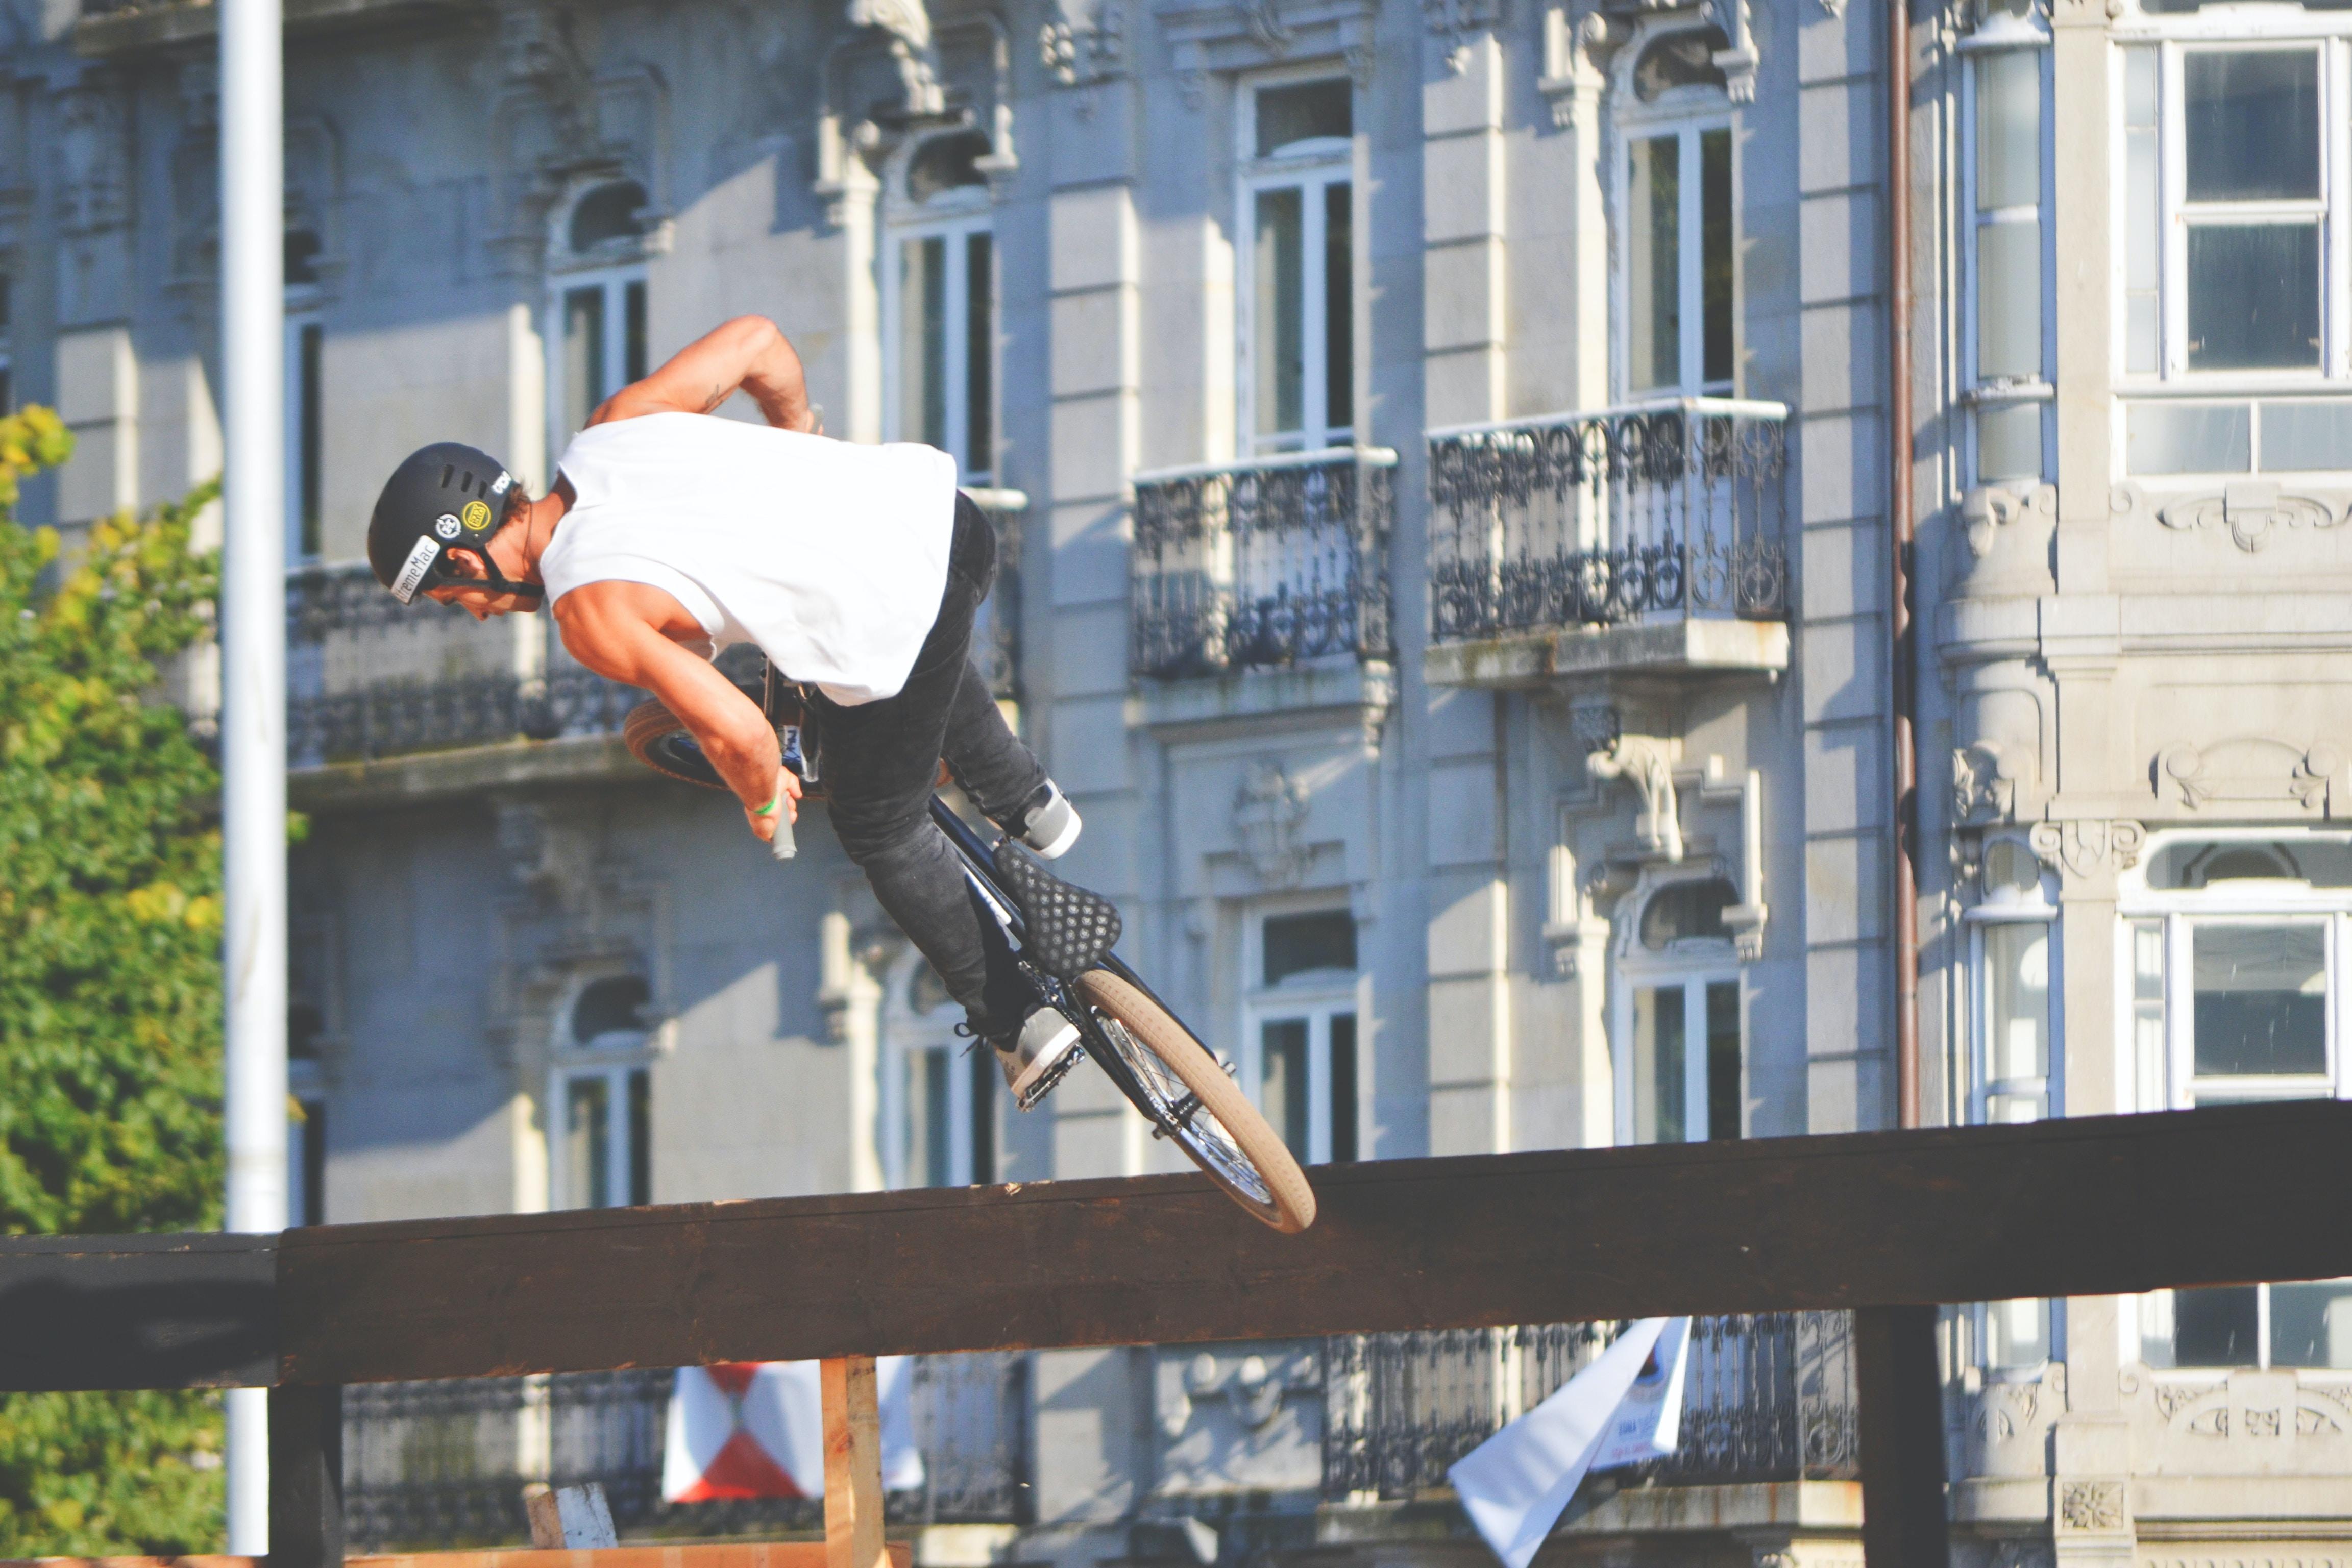 man riding bike doing stunt